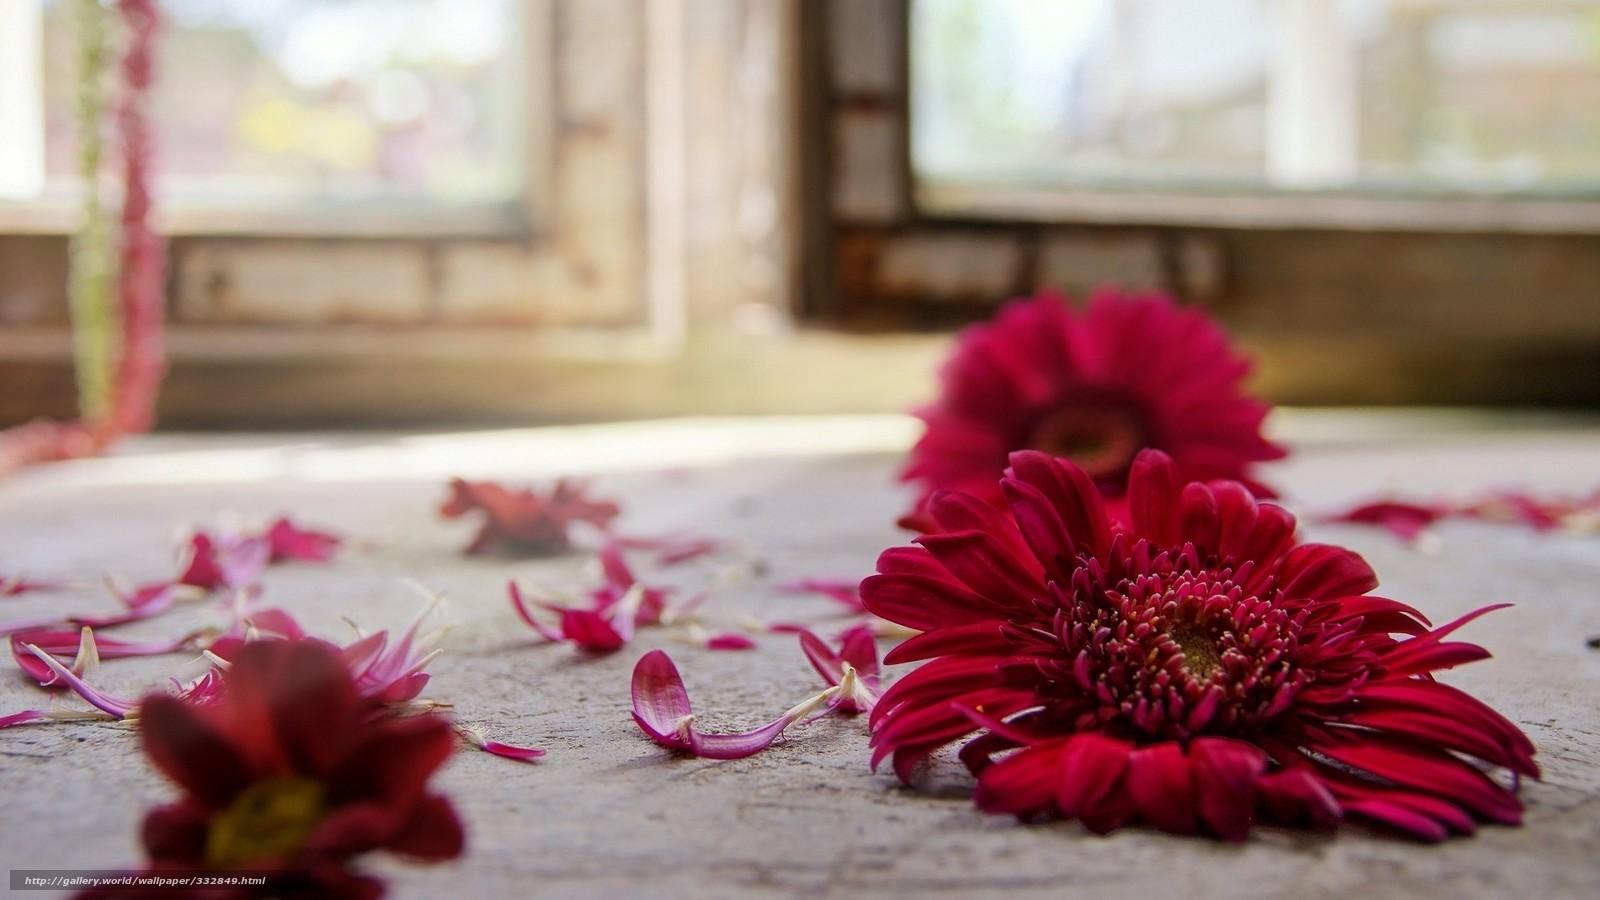 Download wallpaper red,  flower,  gerbera,  on the floor free desktop wallpaper in the resolution 1920x1080 — picture №332849